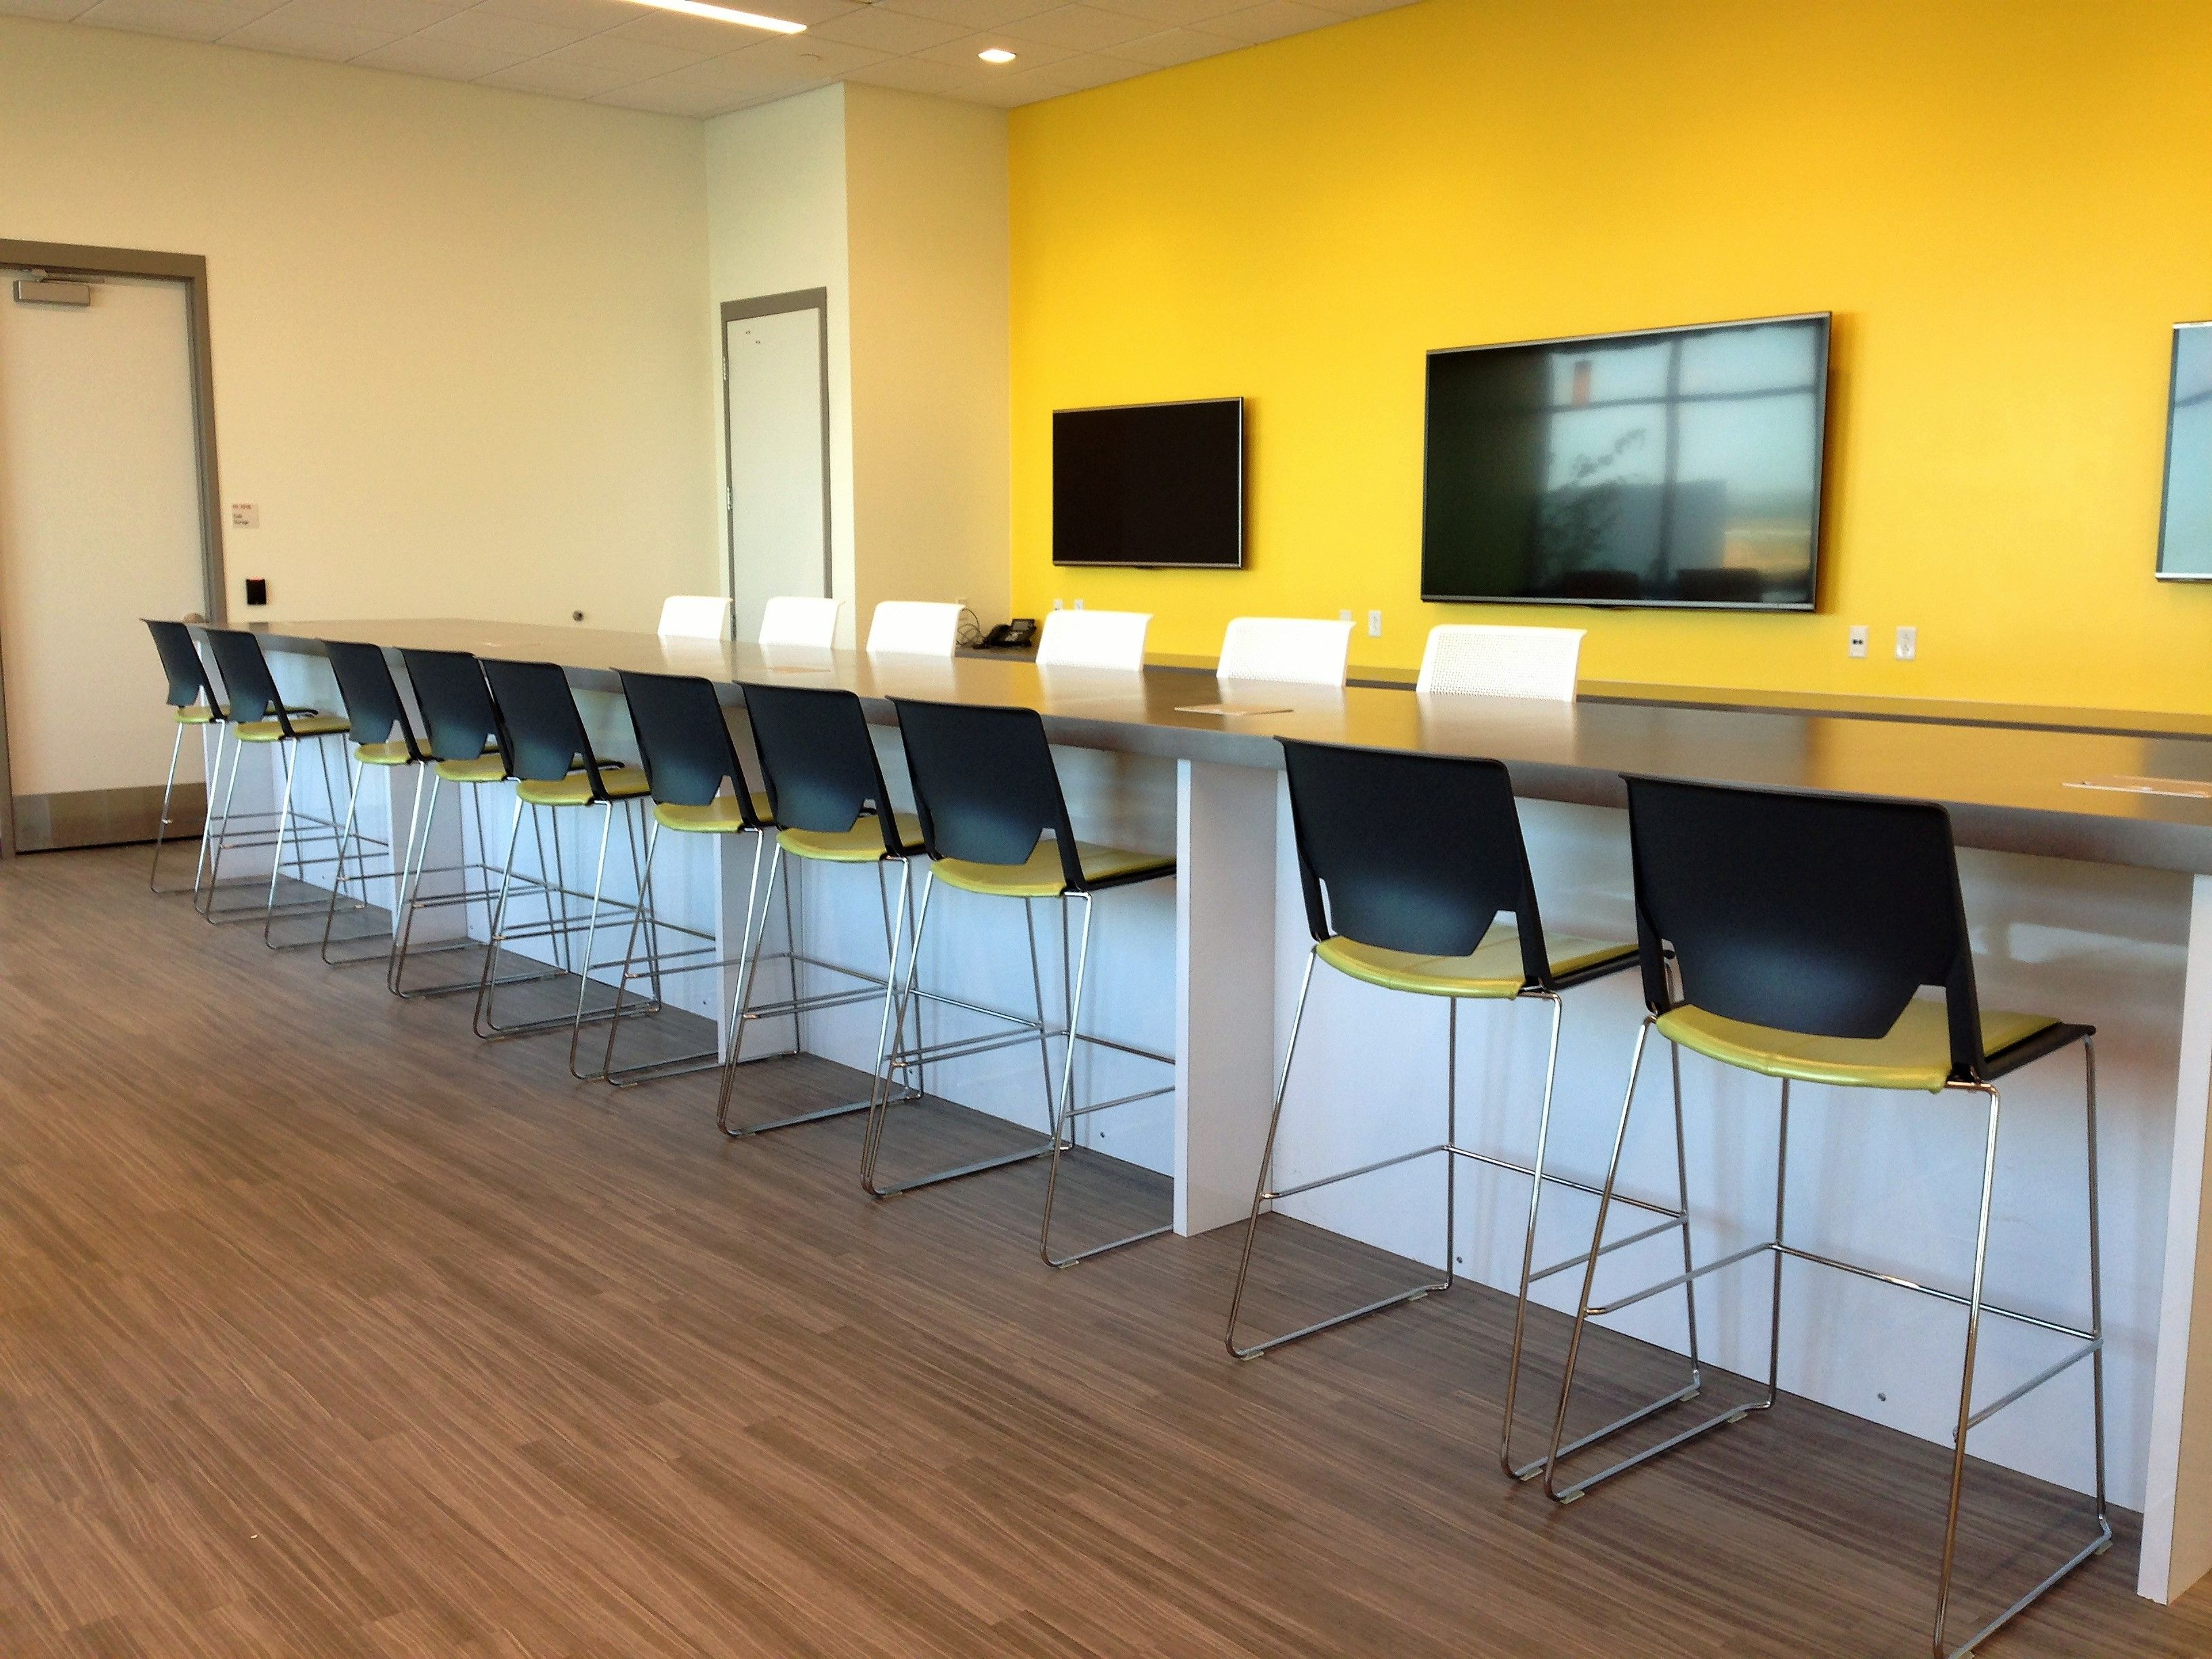 CFI Project ADP El Paso • Tech Cafe cfioffice ADP furniture